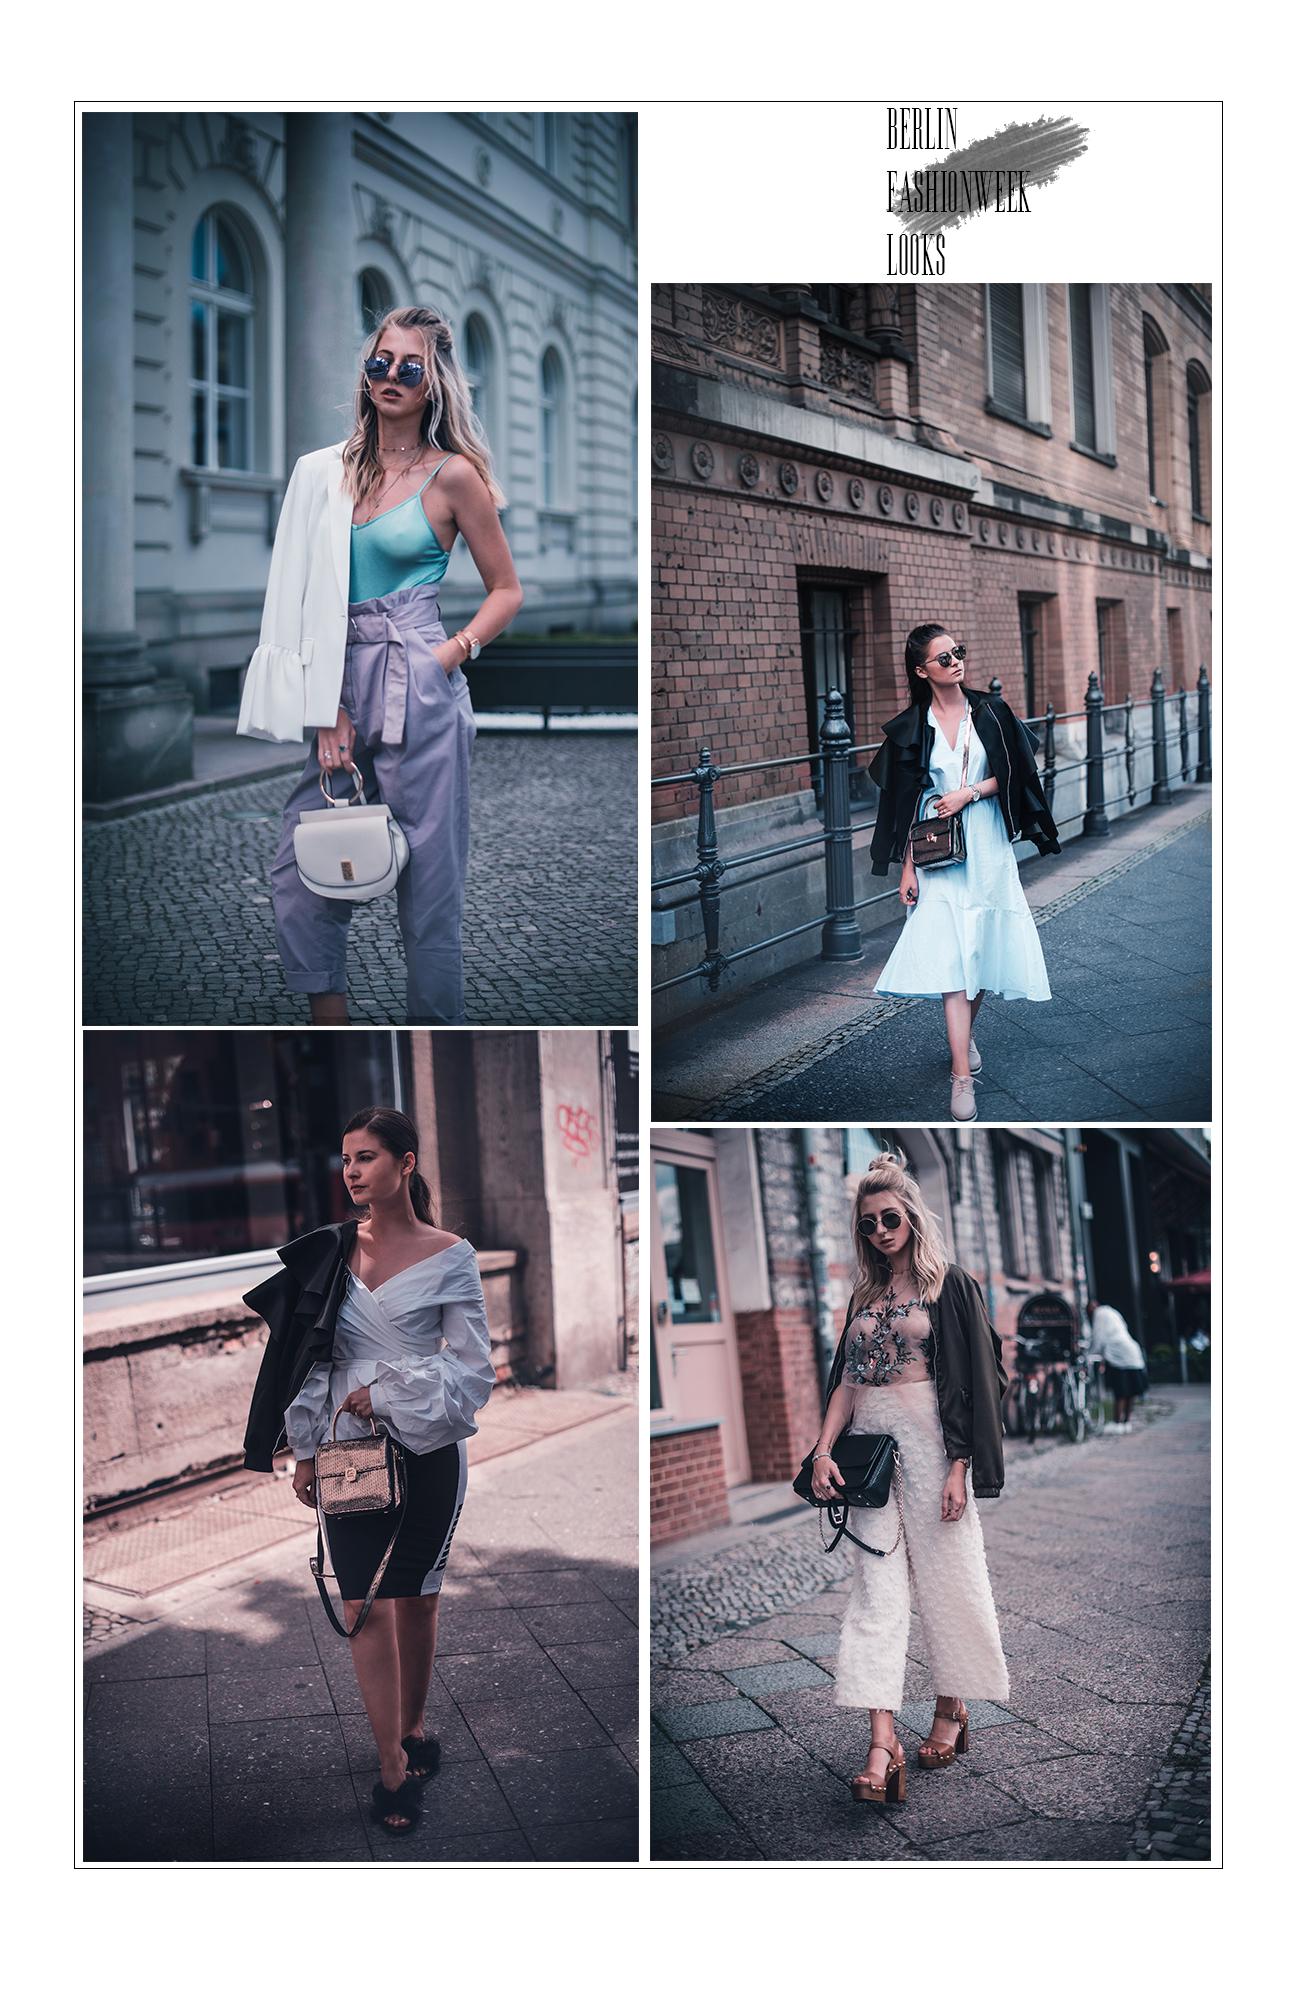 outfits berlin fashion week lifestyle blog münchen